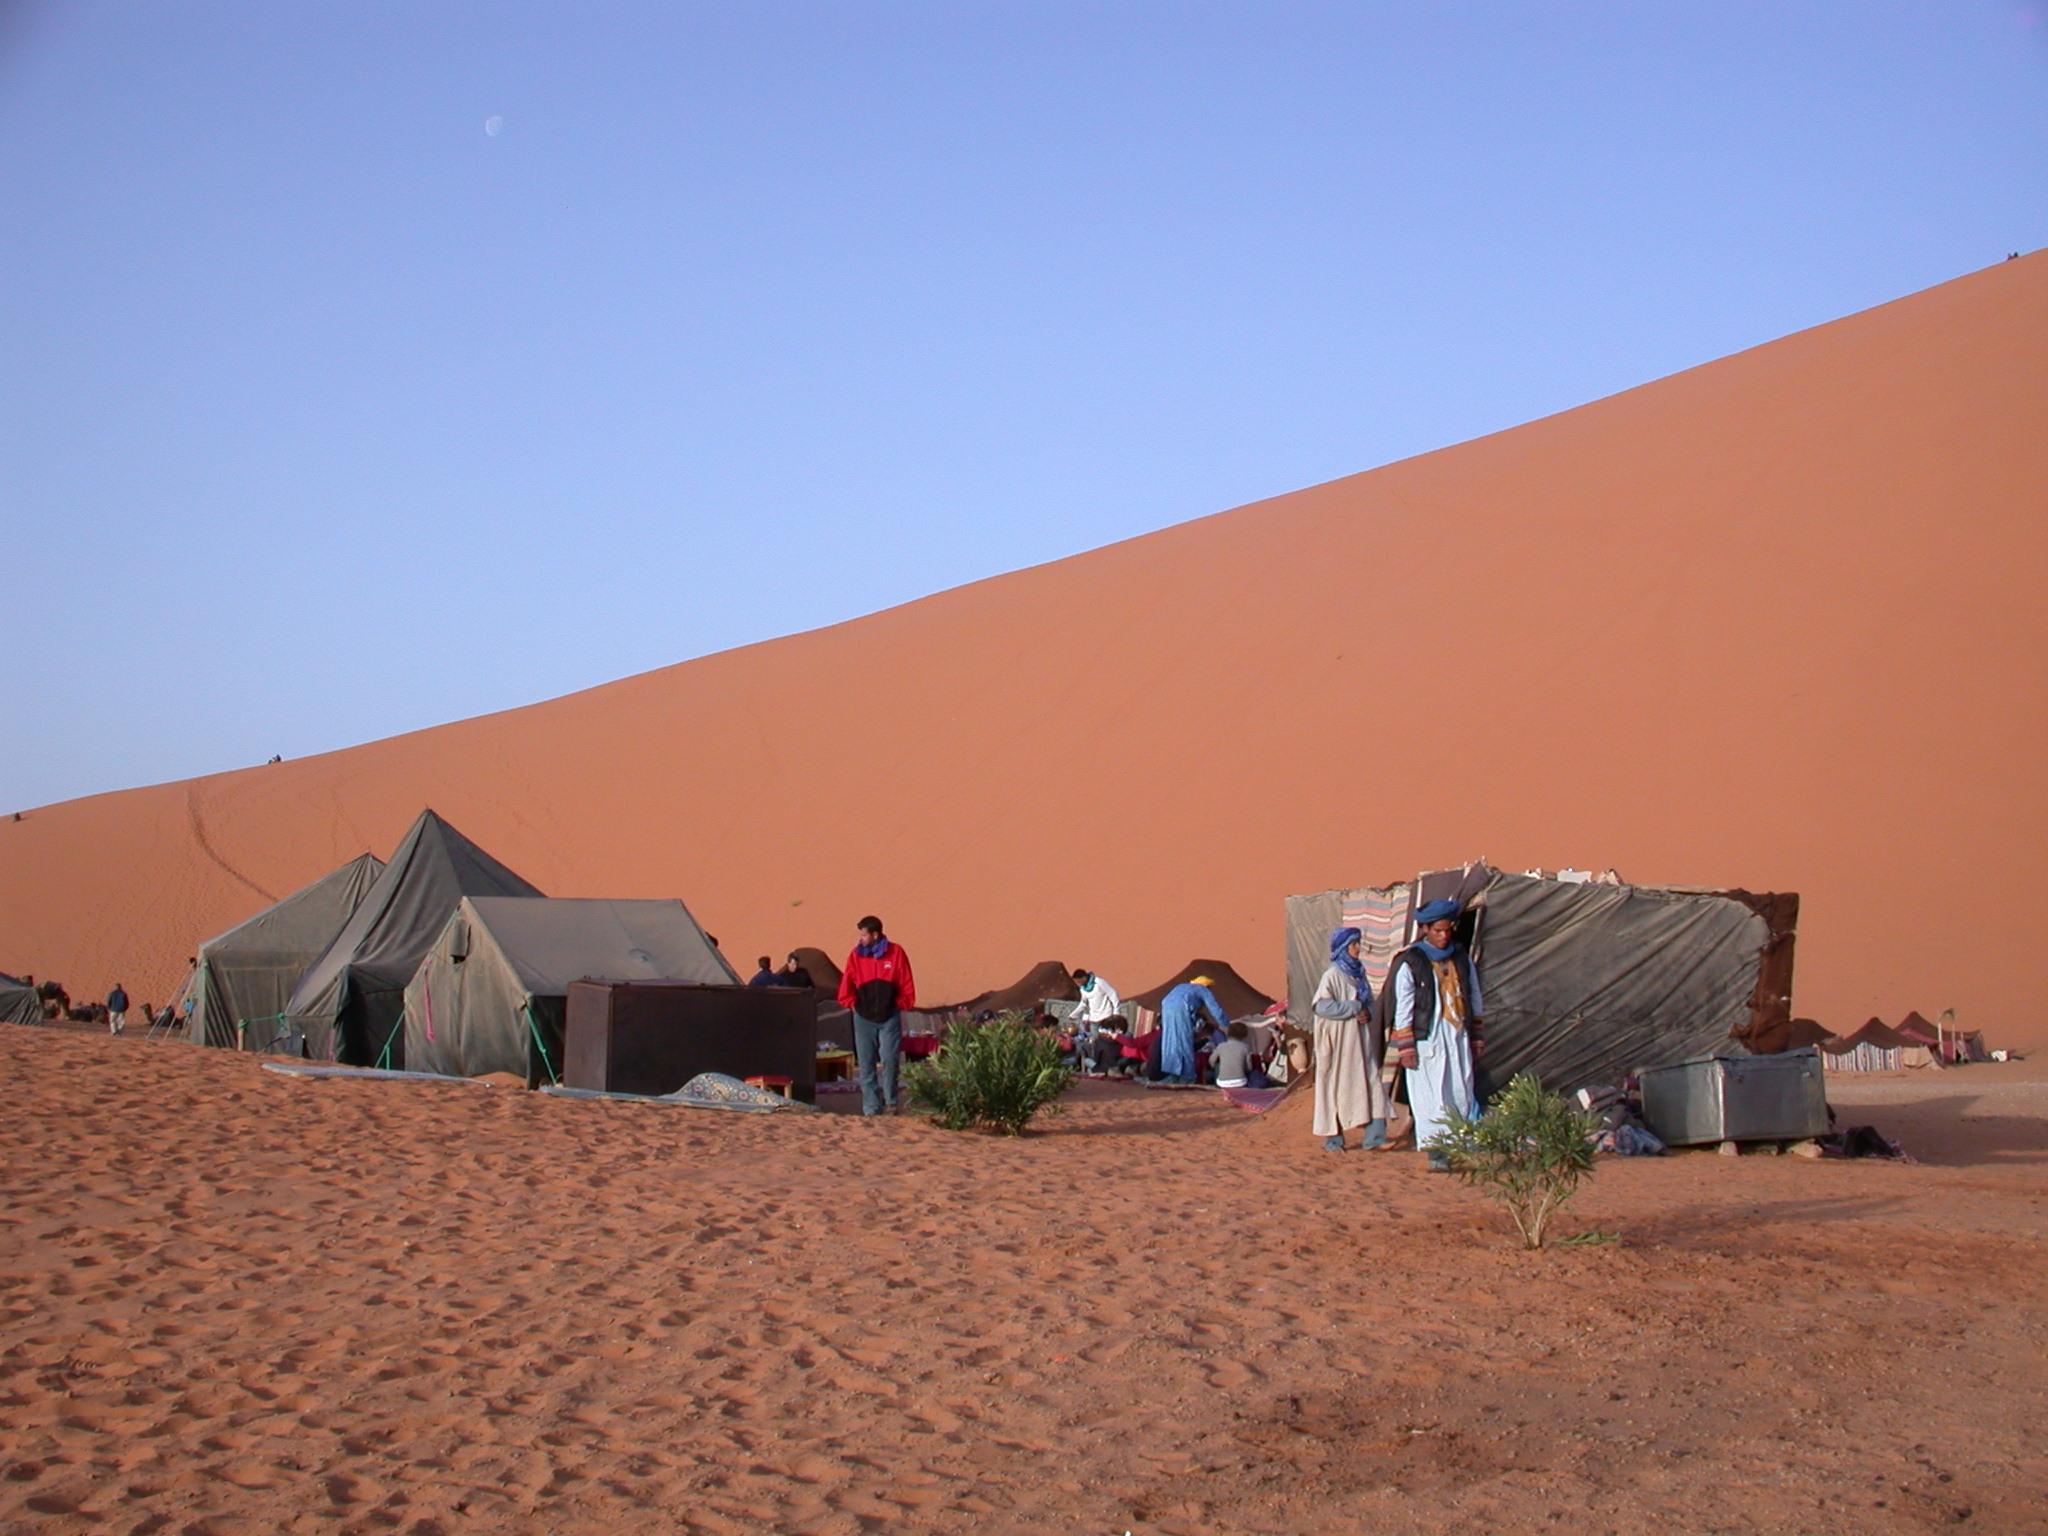 Luca Errera, Daniela Trastulli, Marocco, deserto, camp